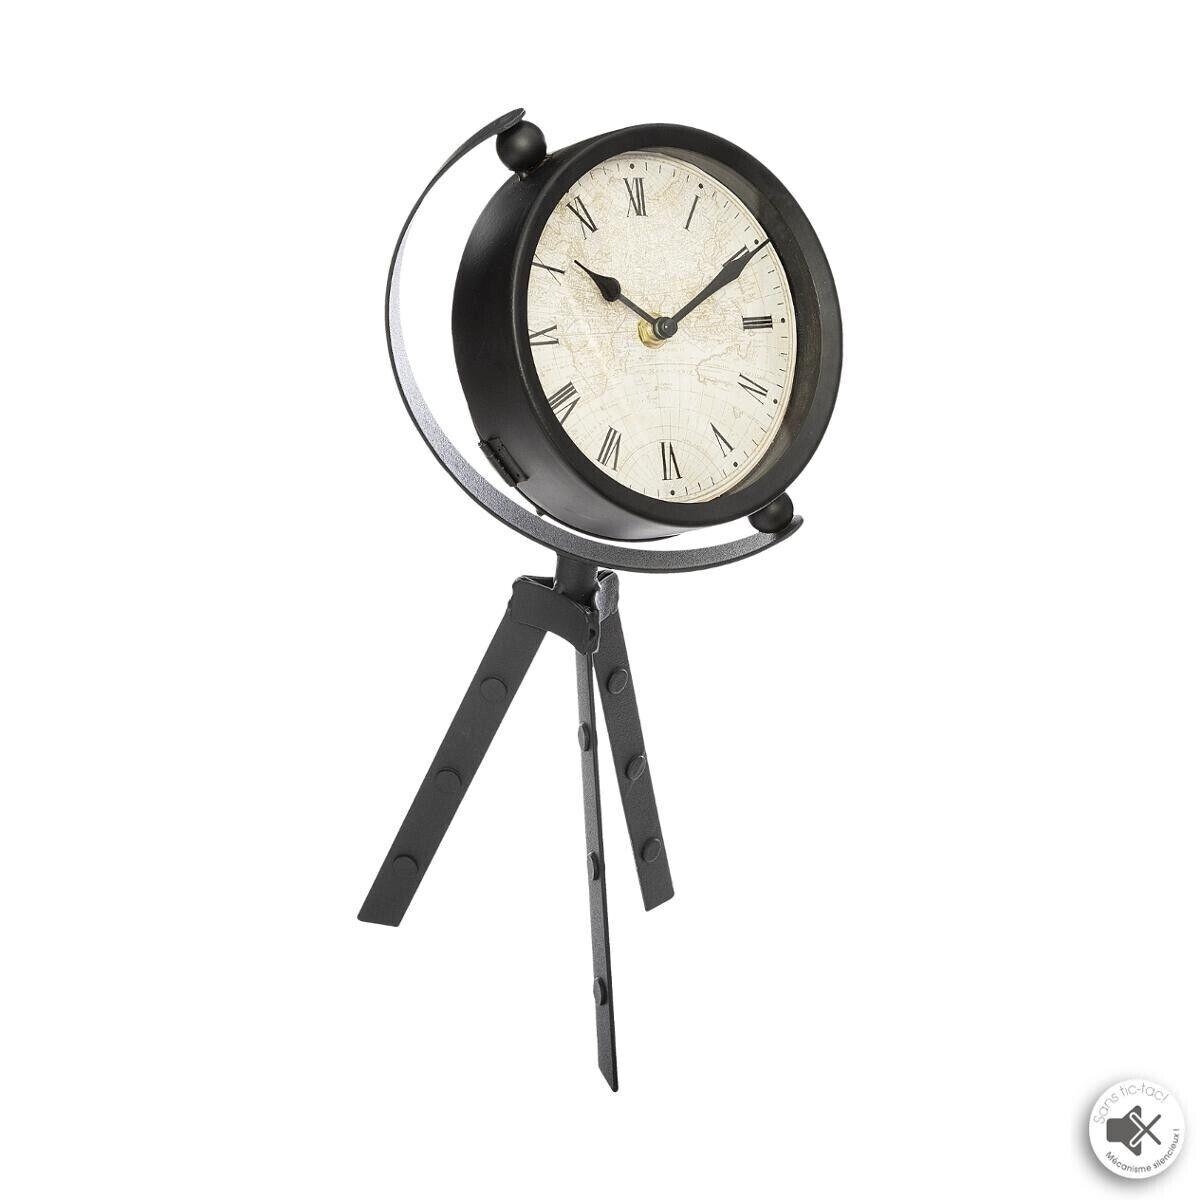 Atmosphera Horloge trépied à poser H36 cm